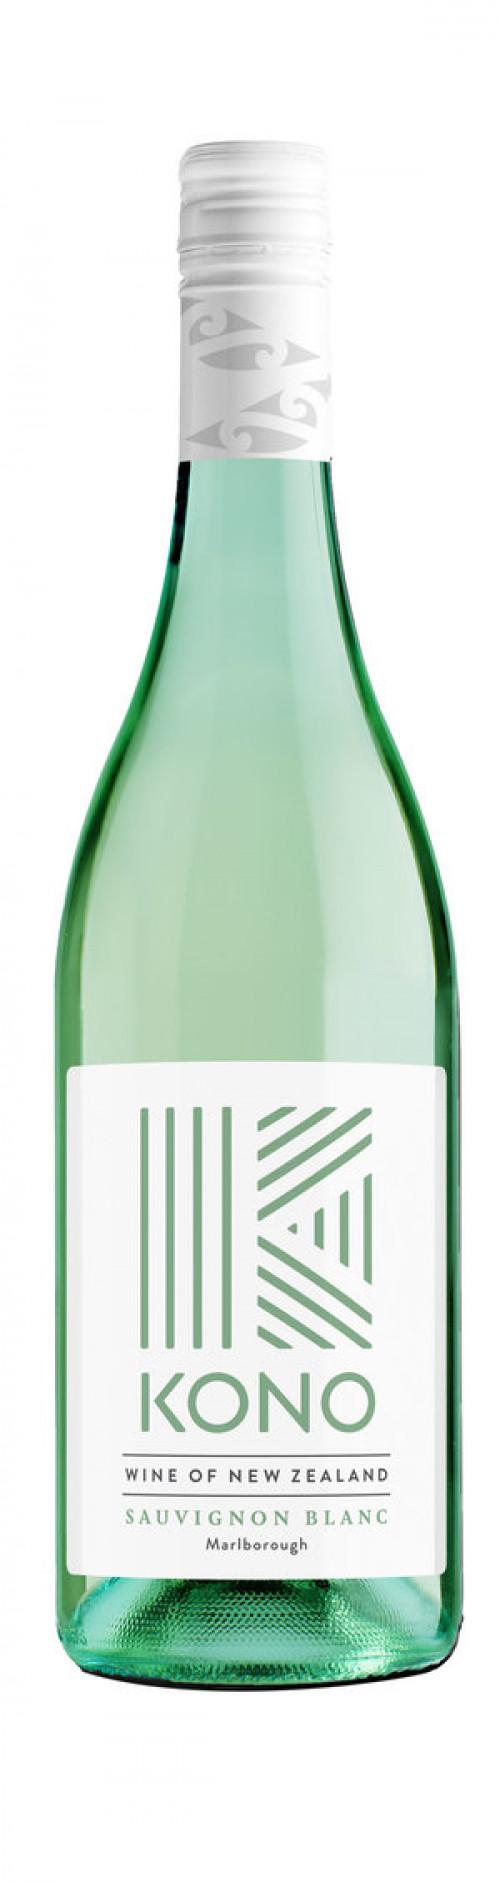 2019 Kono Sauvignon Blanc 750ml